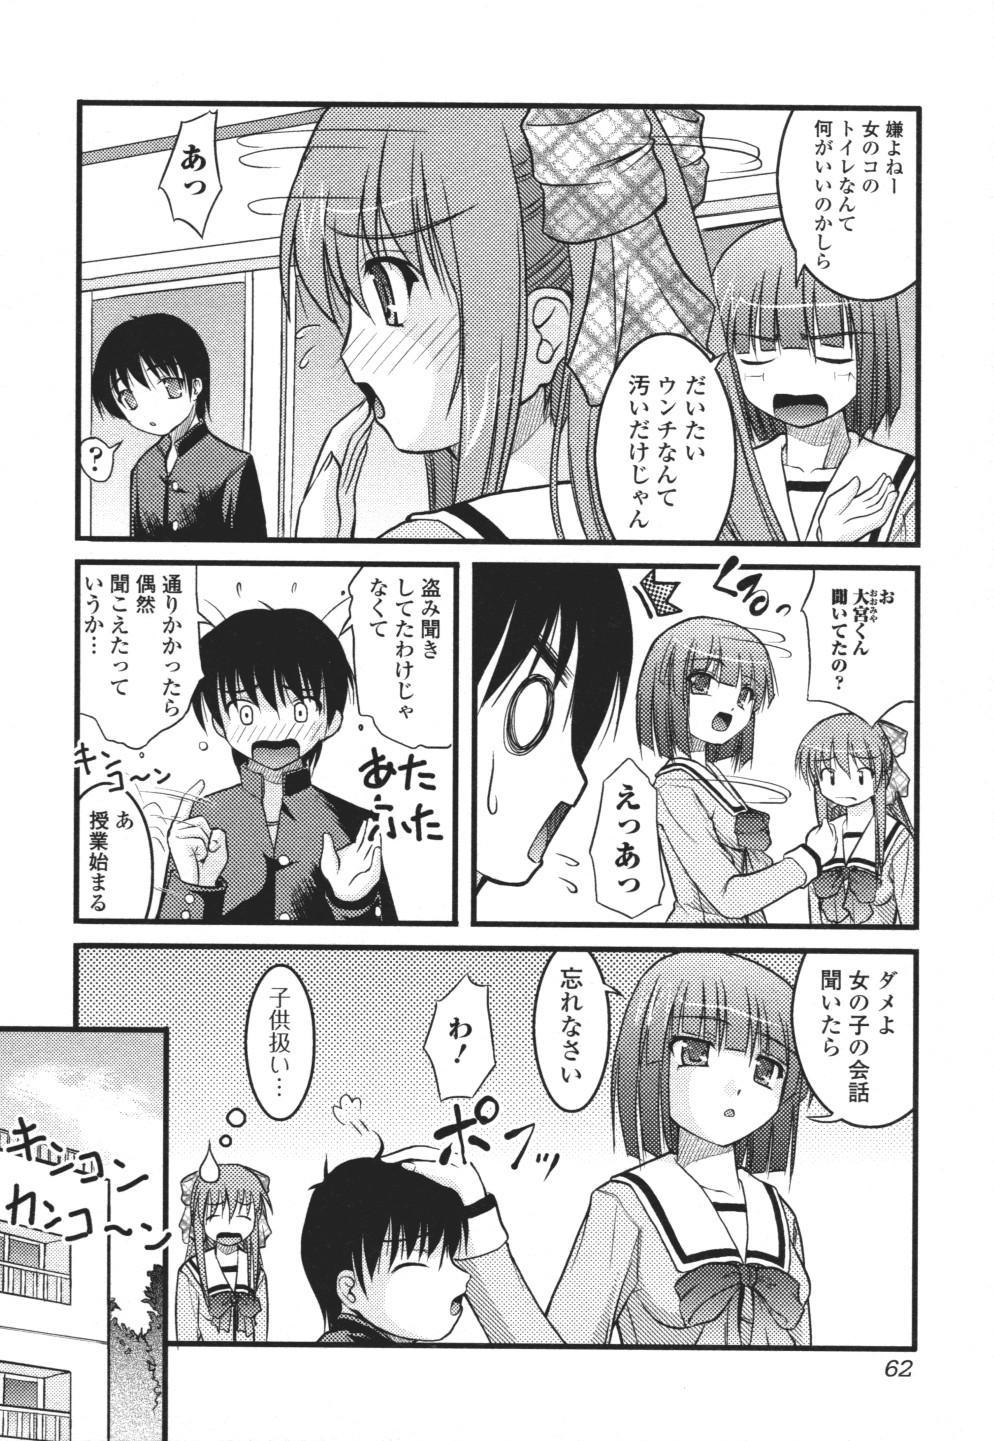 Nozoite wa Ikenai 3 - Do Not Peep! 3 62